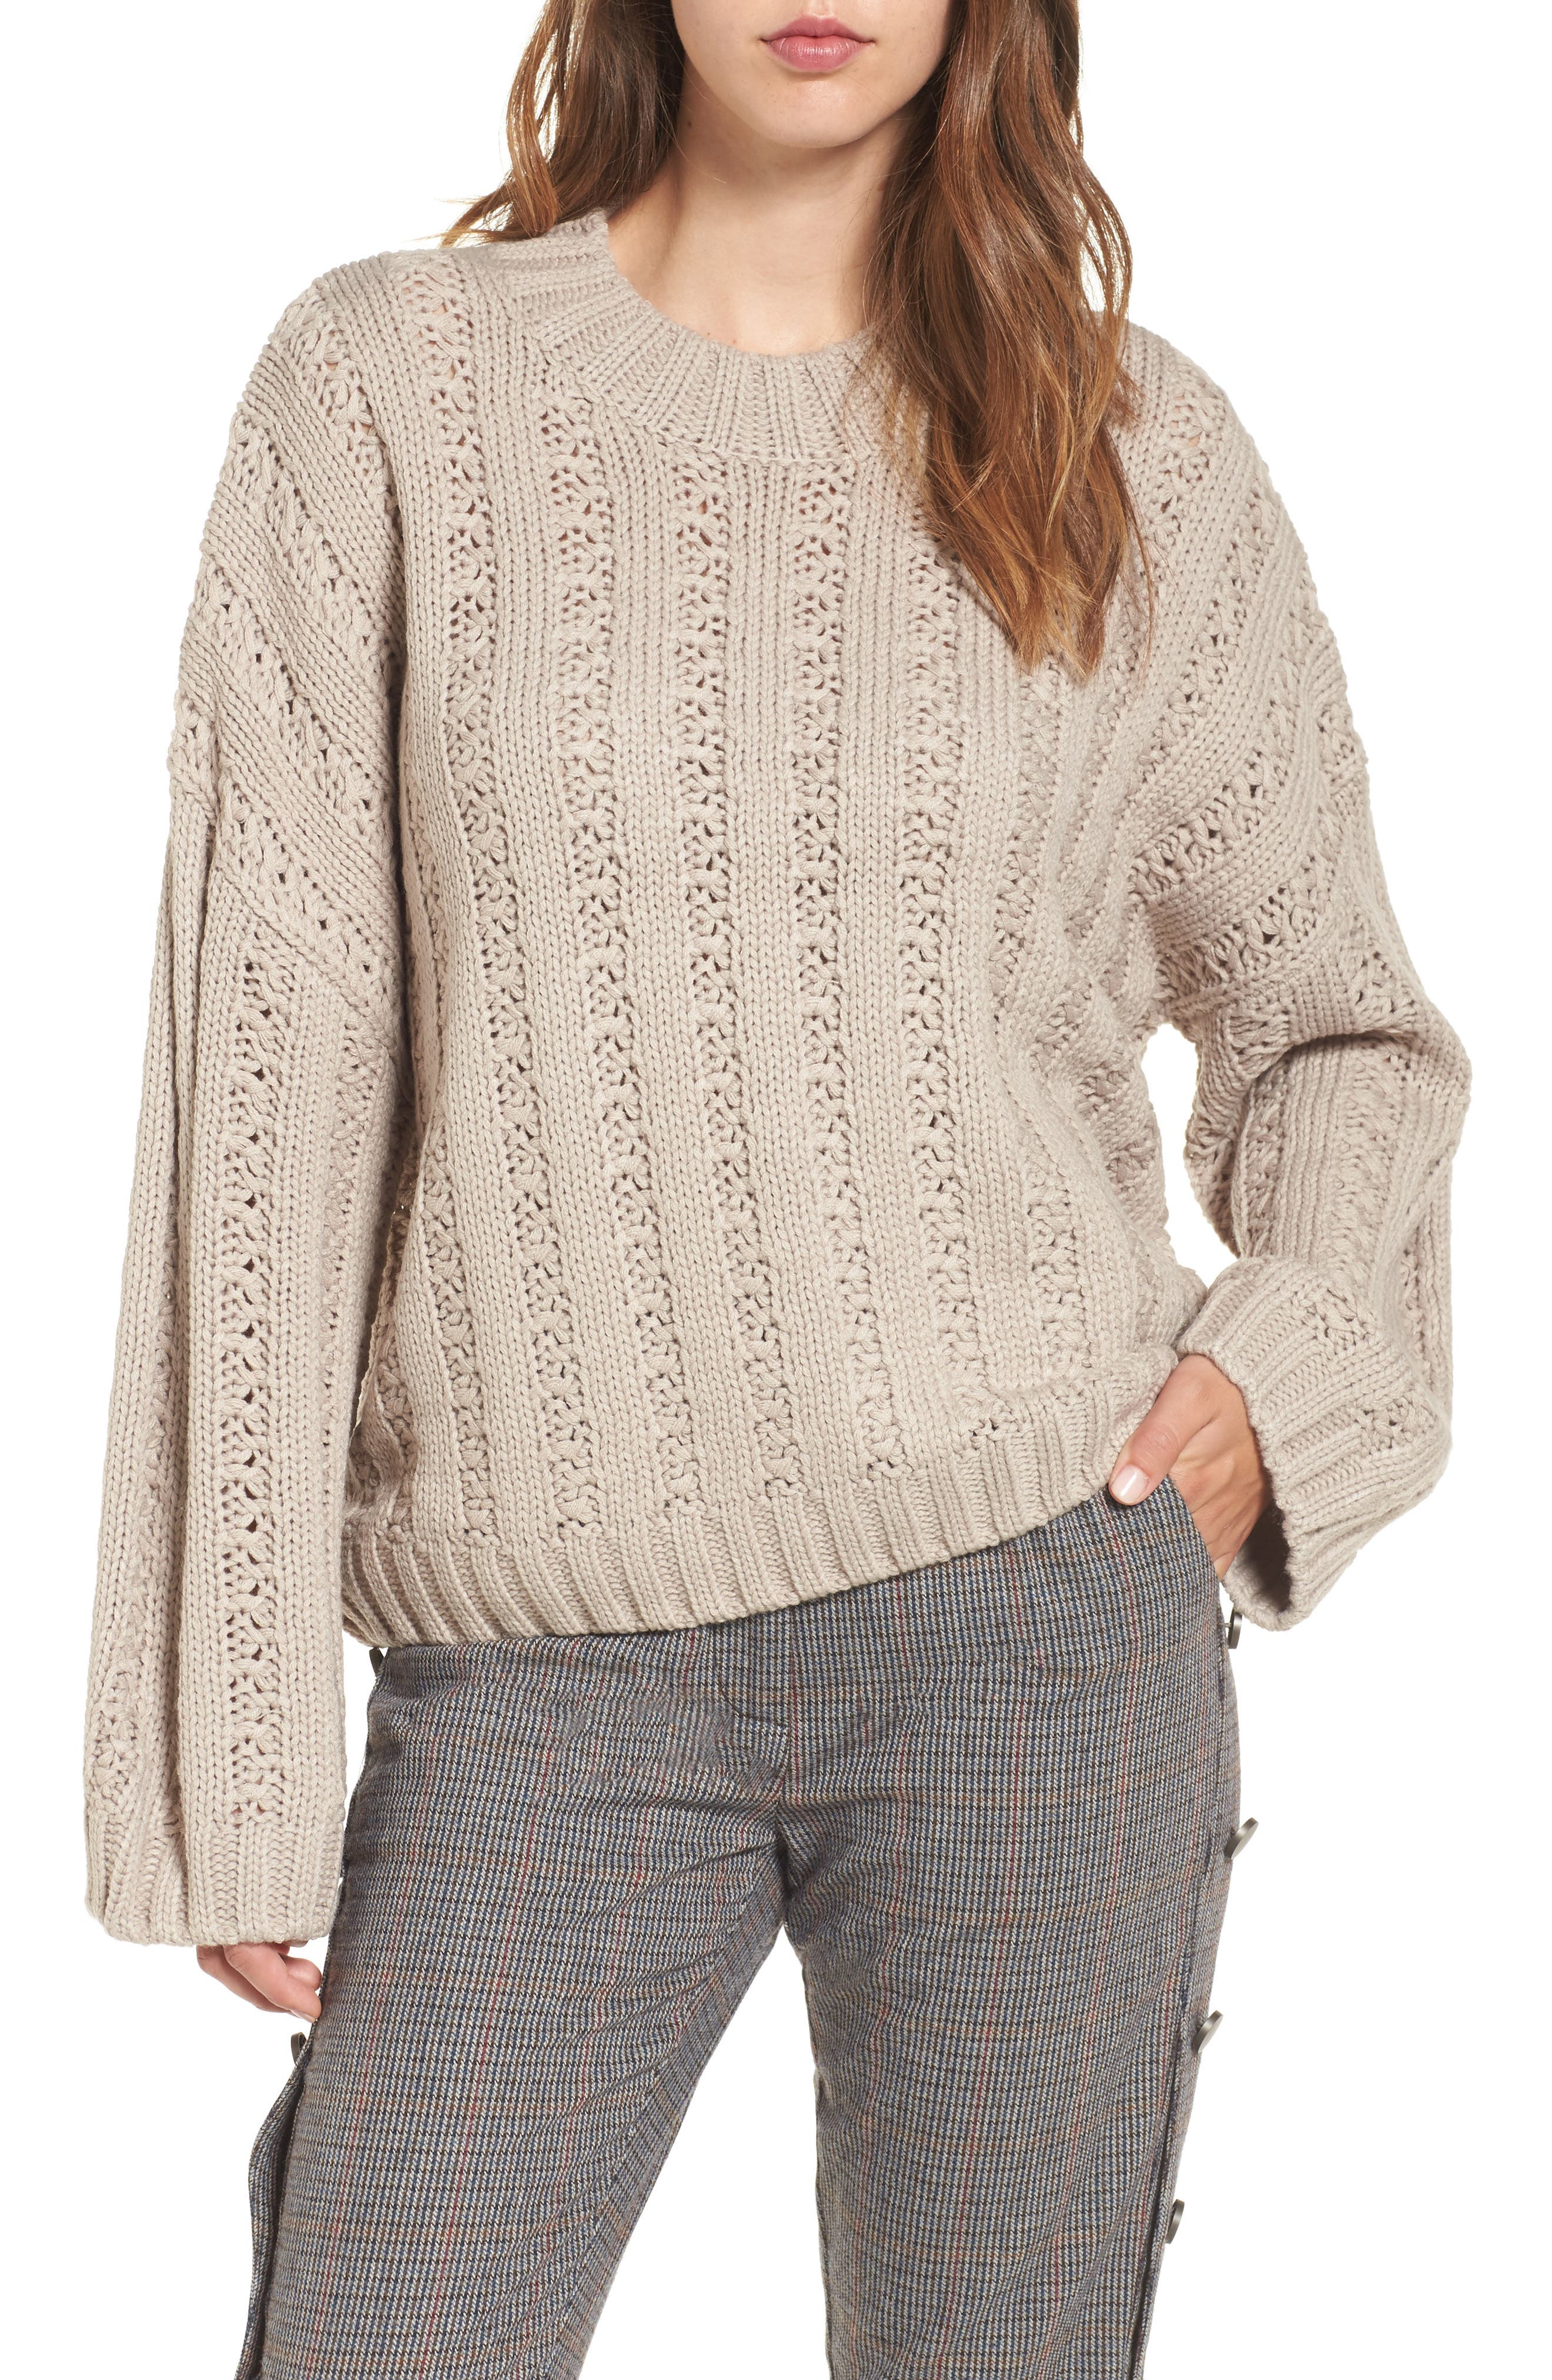 Main Image - J.O.A. Chunky Textured Sweater